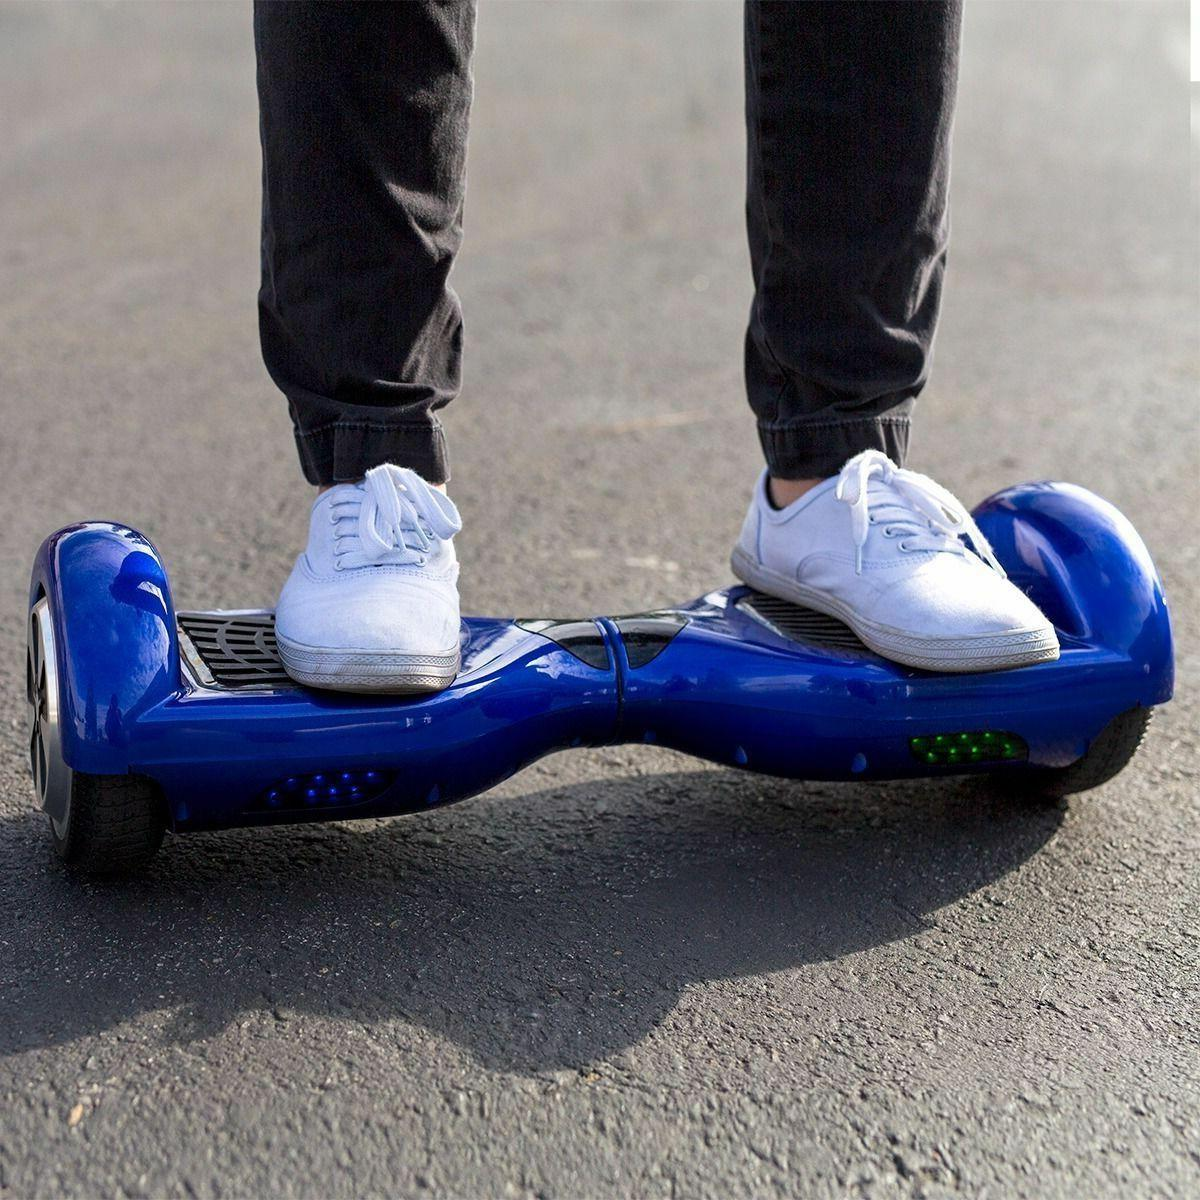 Hoverboard Wheel Electric Self balance skateboard Rider